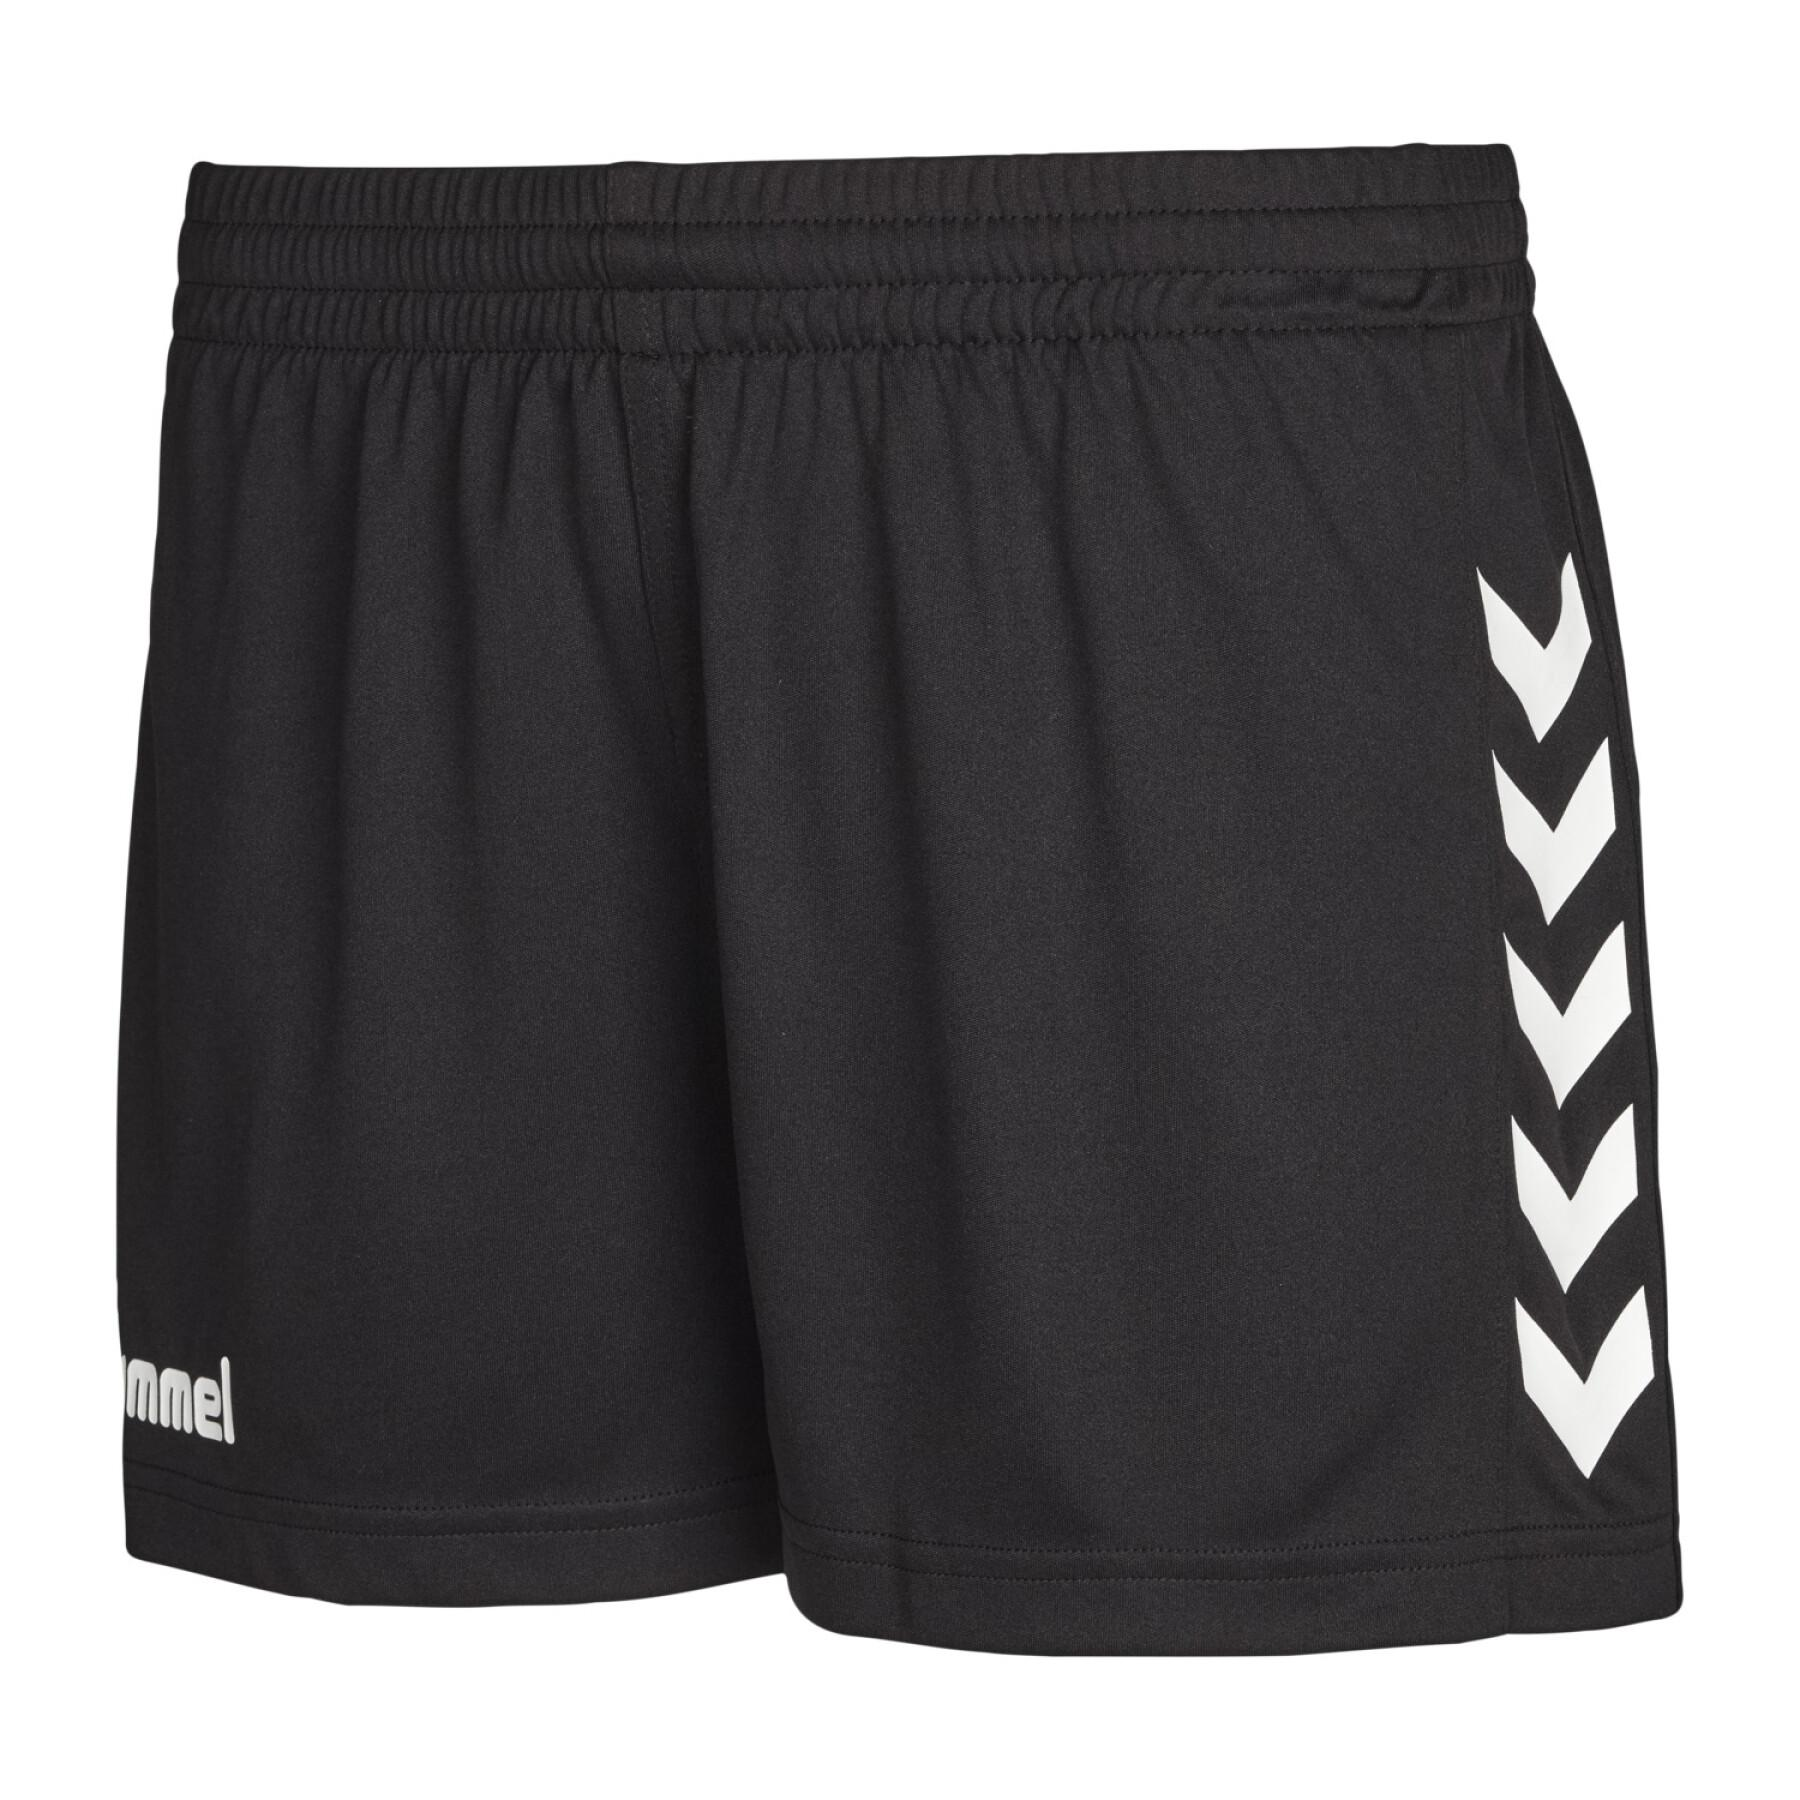 Women's shorts Hummel hmlCORE